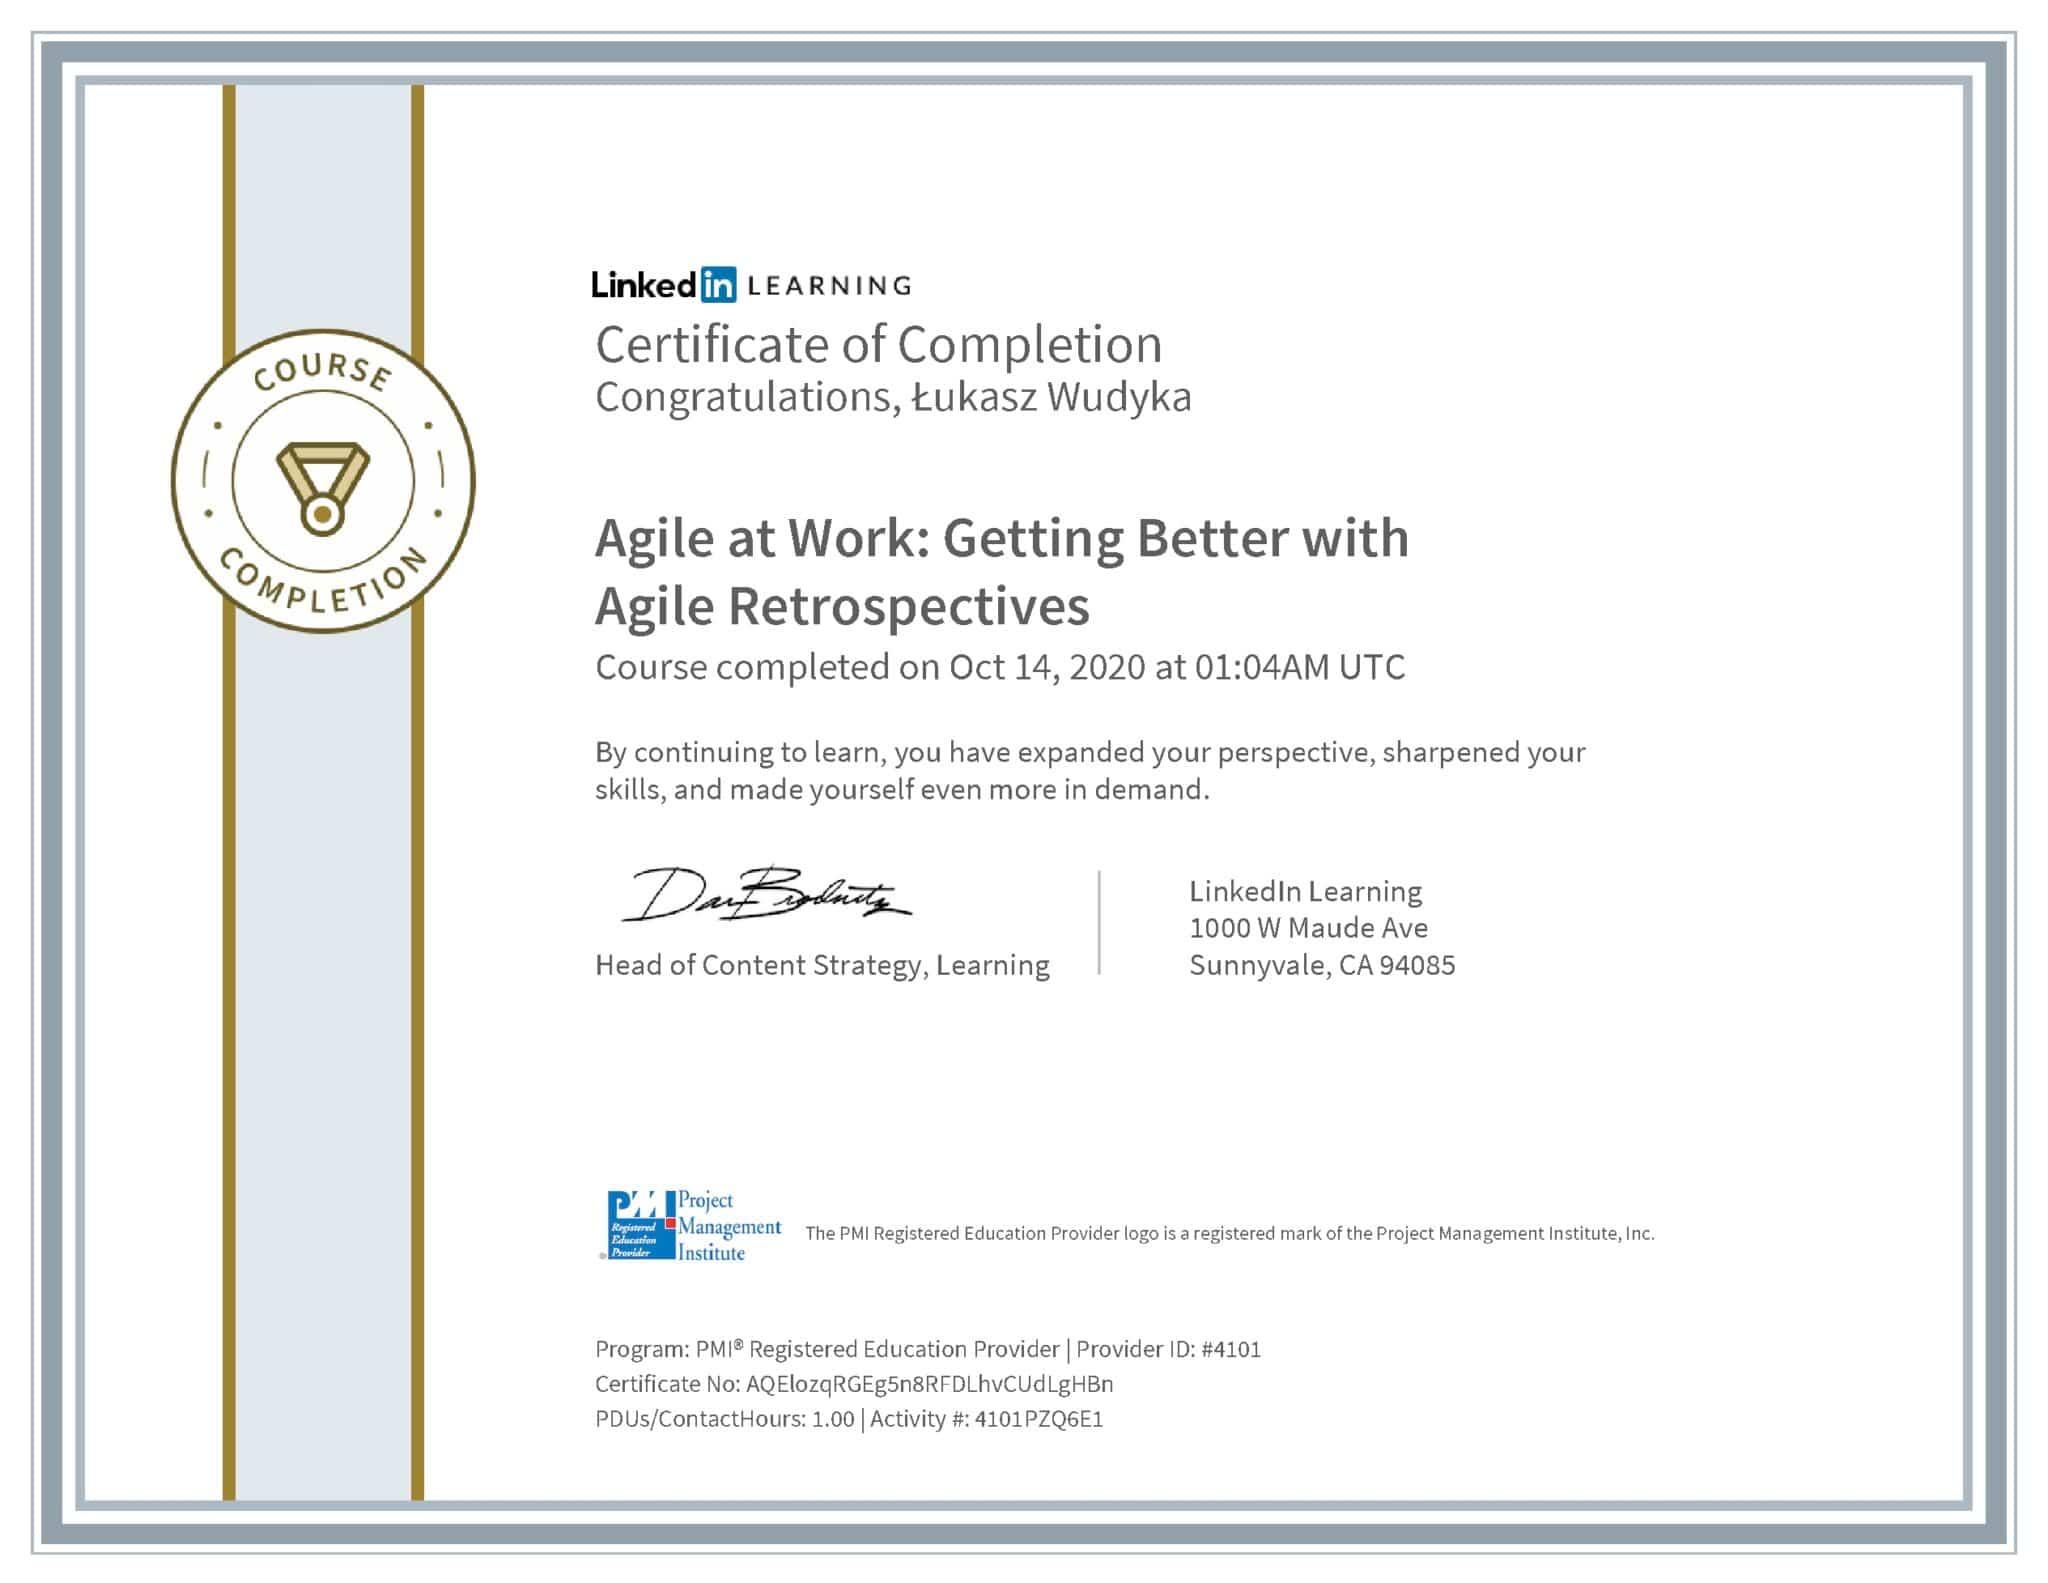 Łukasz Wudyka certyfikat LinkedIn Agile at Work: Getting Better with Agile Retrospectives PMI